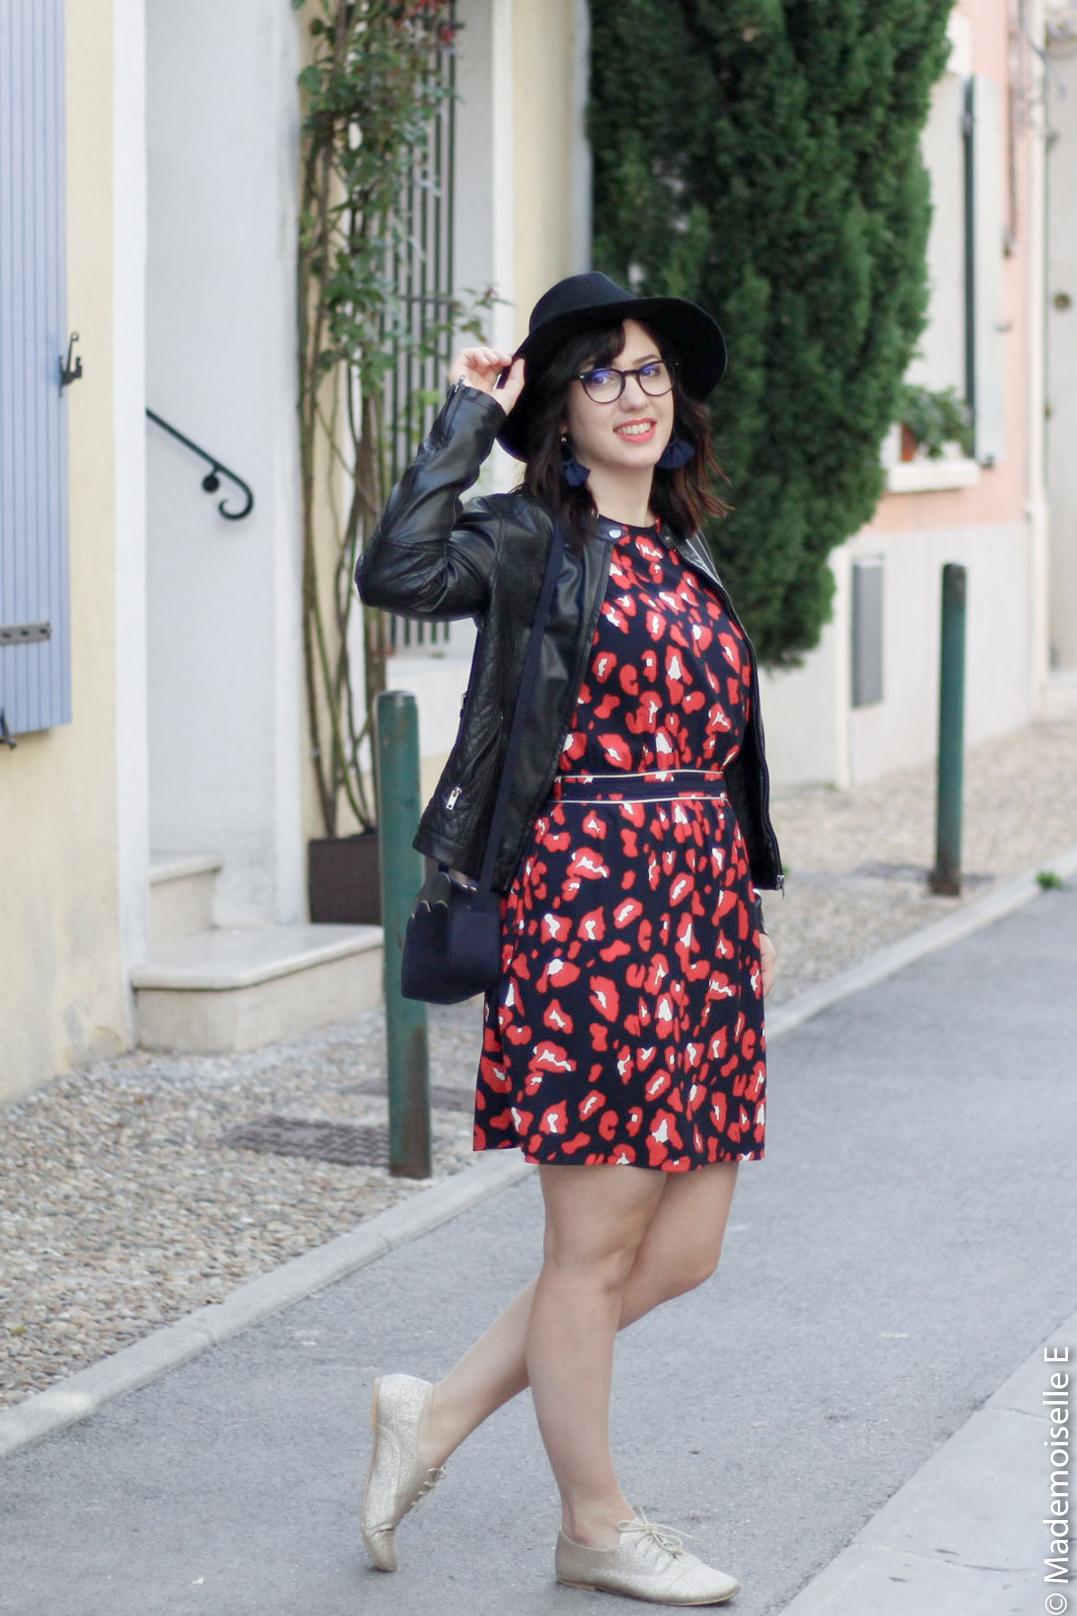 robe leopard tendance 2018 10 mademoiselle-e